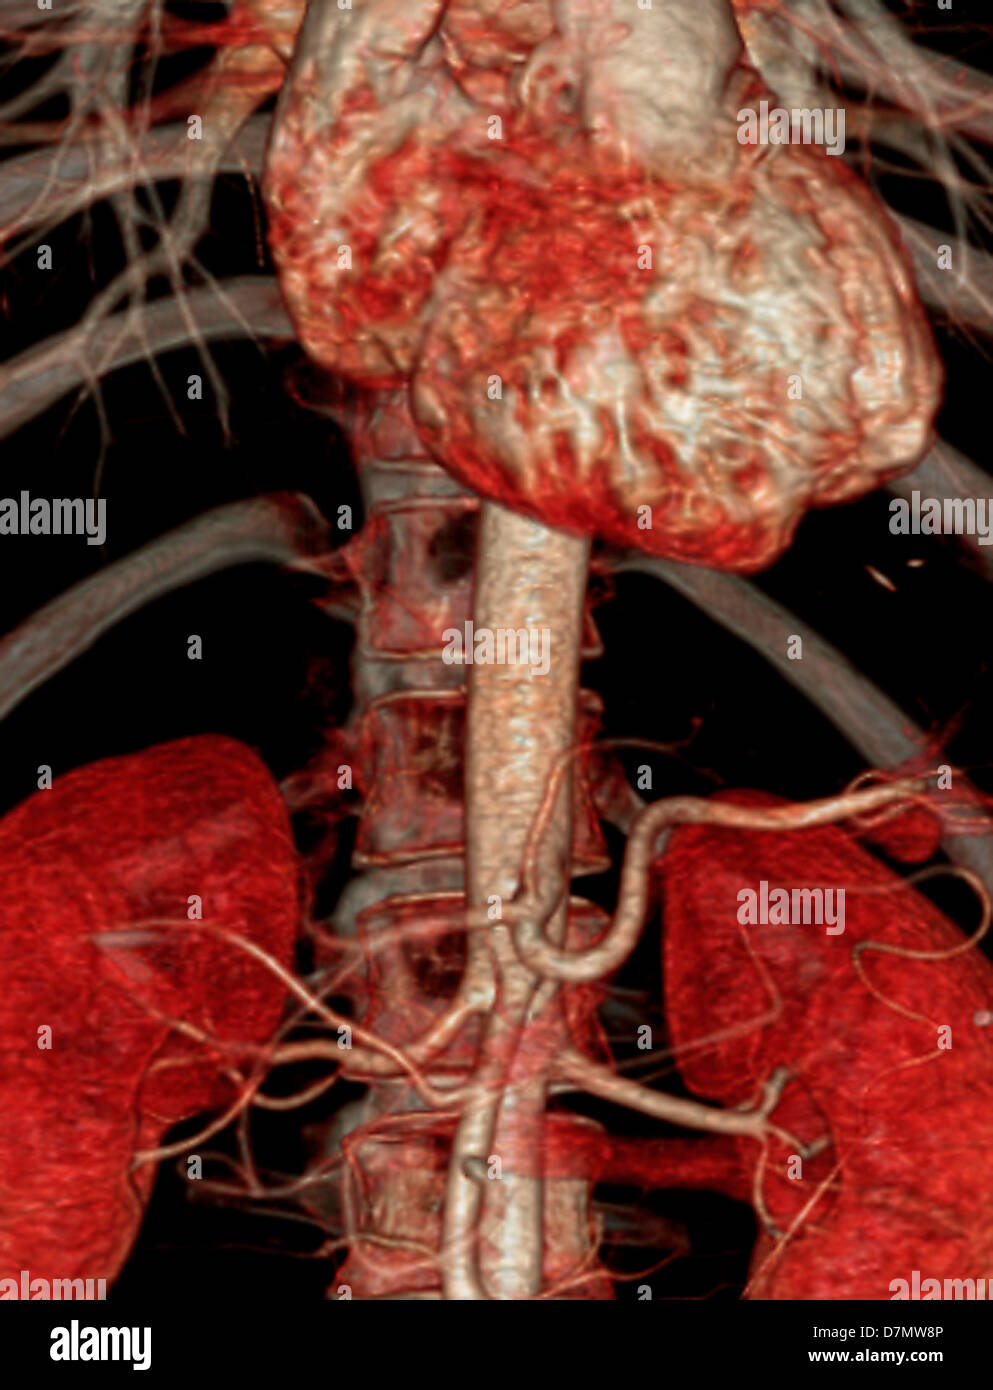 Abdominal Aorta 3d Ct Scan Stock Photo 56392582 Alamy